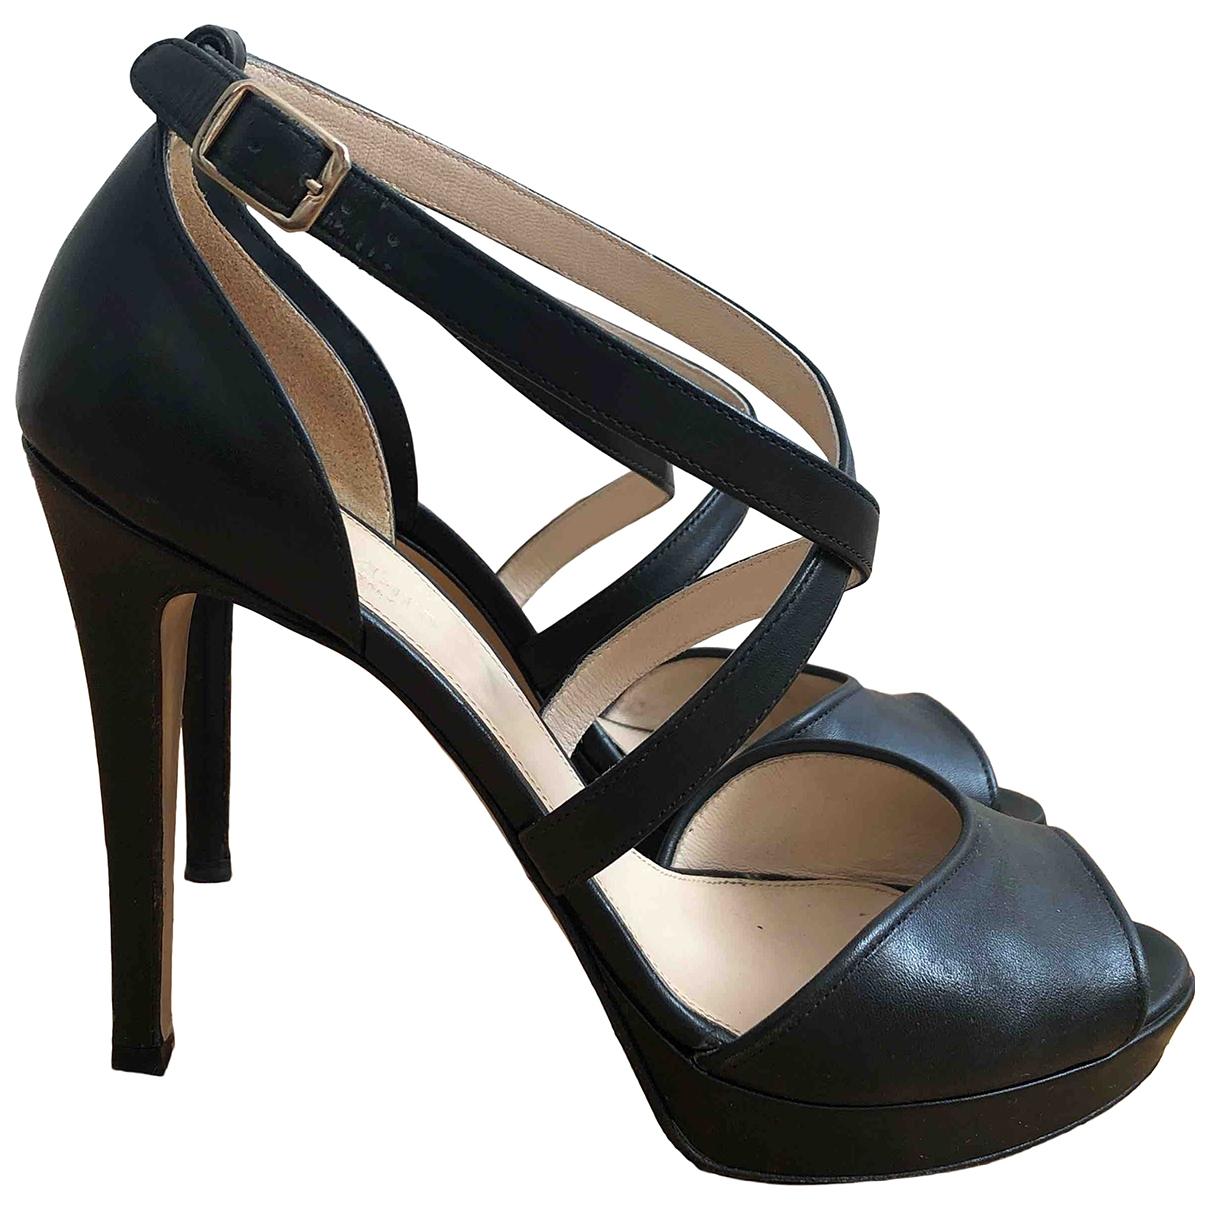 Max Mara \N Black Leather Sandals for Women 40 EU